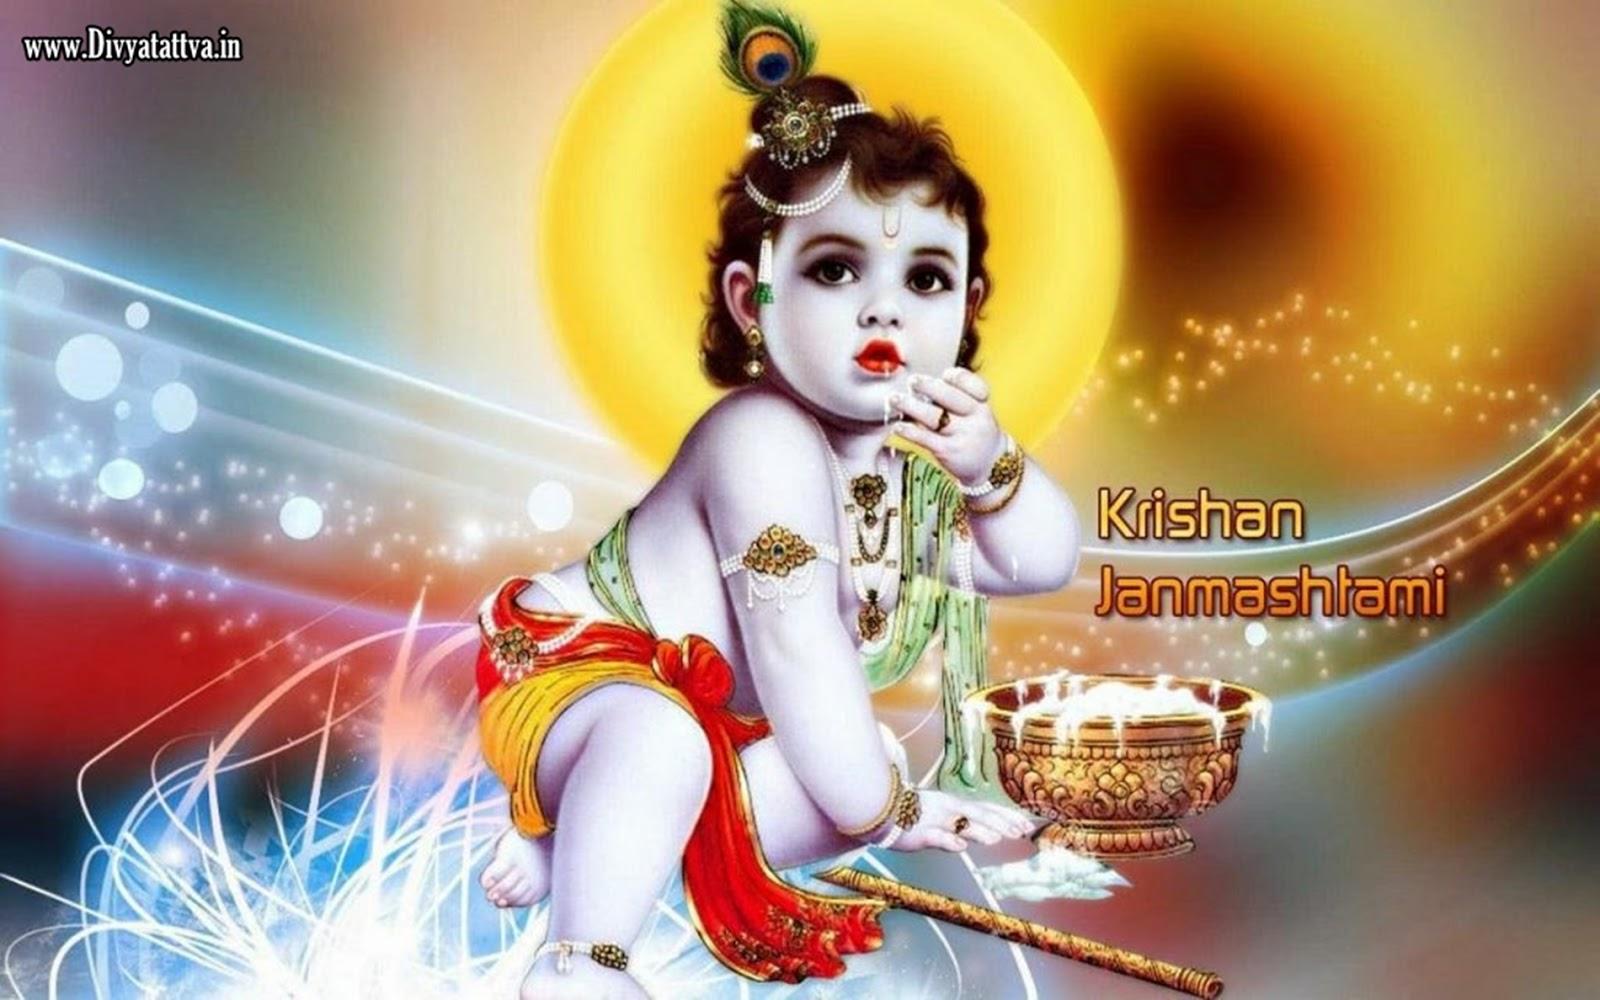 Divyatattva Astrology Free Horoscopes Psychic Tarot Yoga Tantra Occult Images Videos Sri Krishna Bala Gopala Wllpapers Janamashtami Baby Krishna Hd Photos